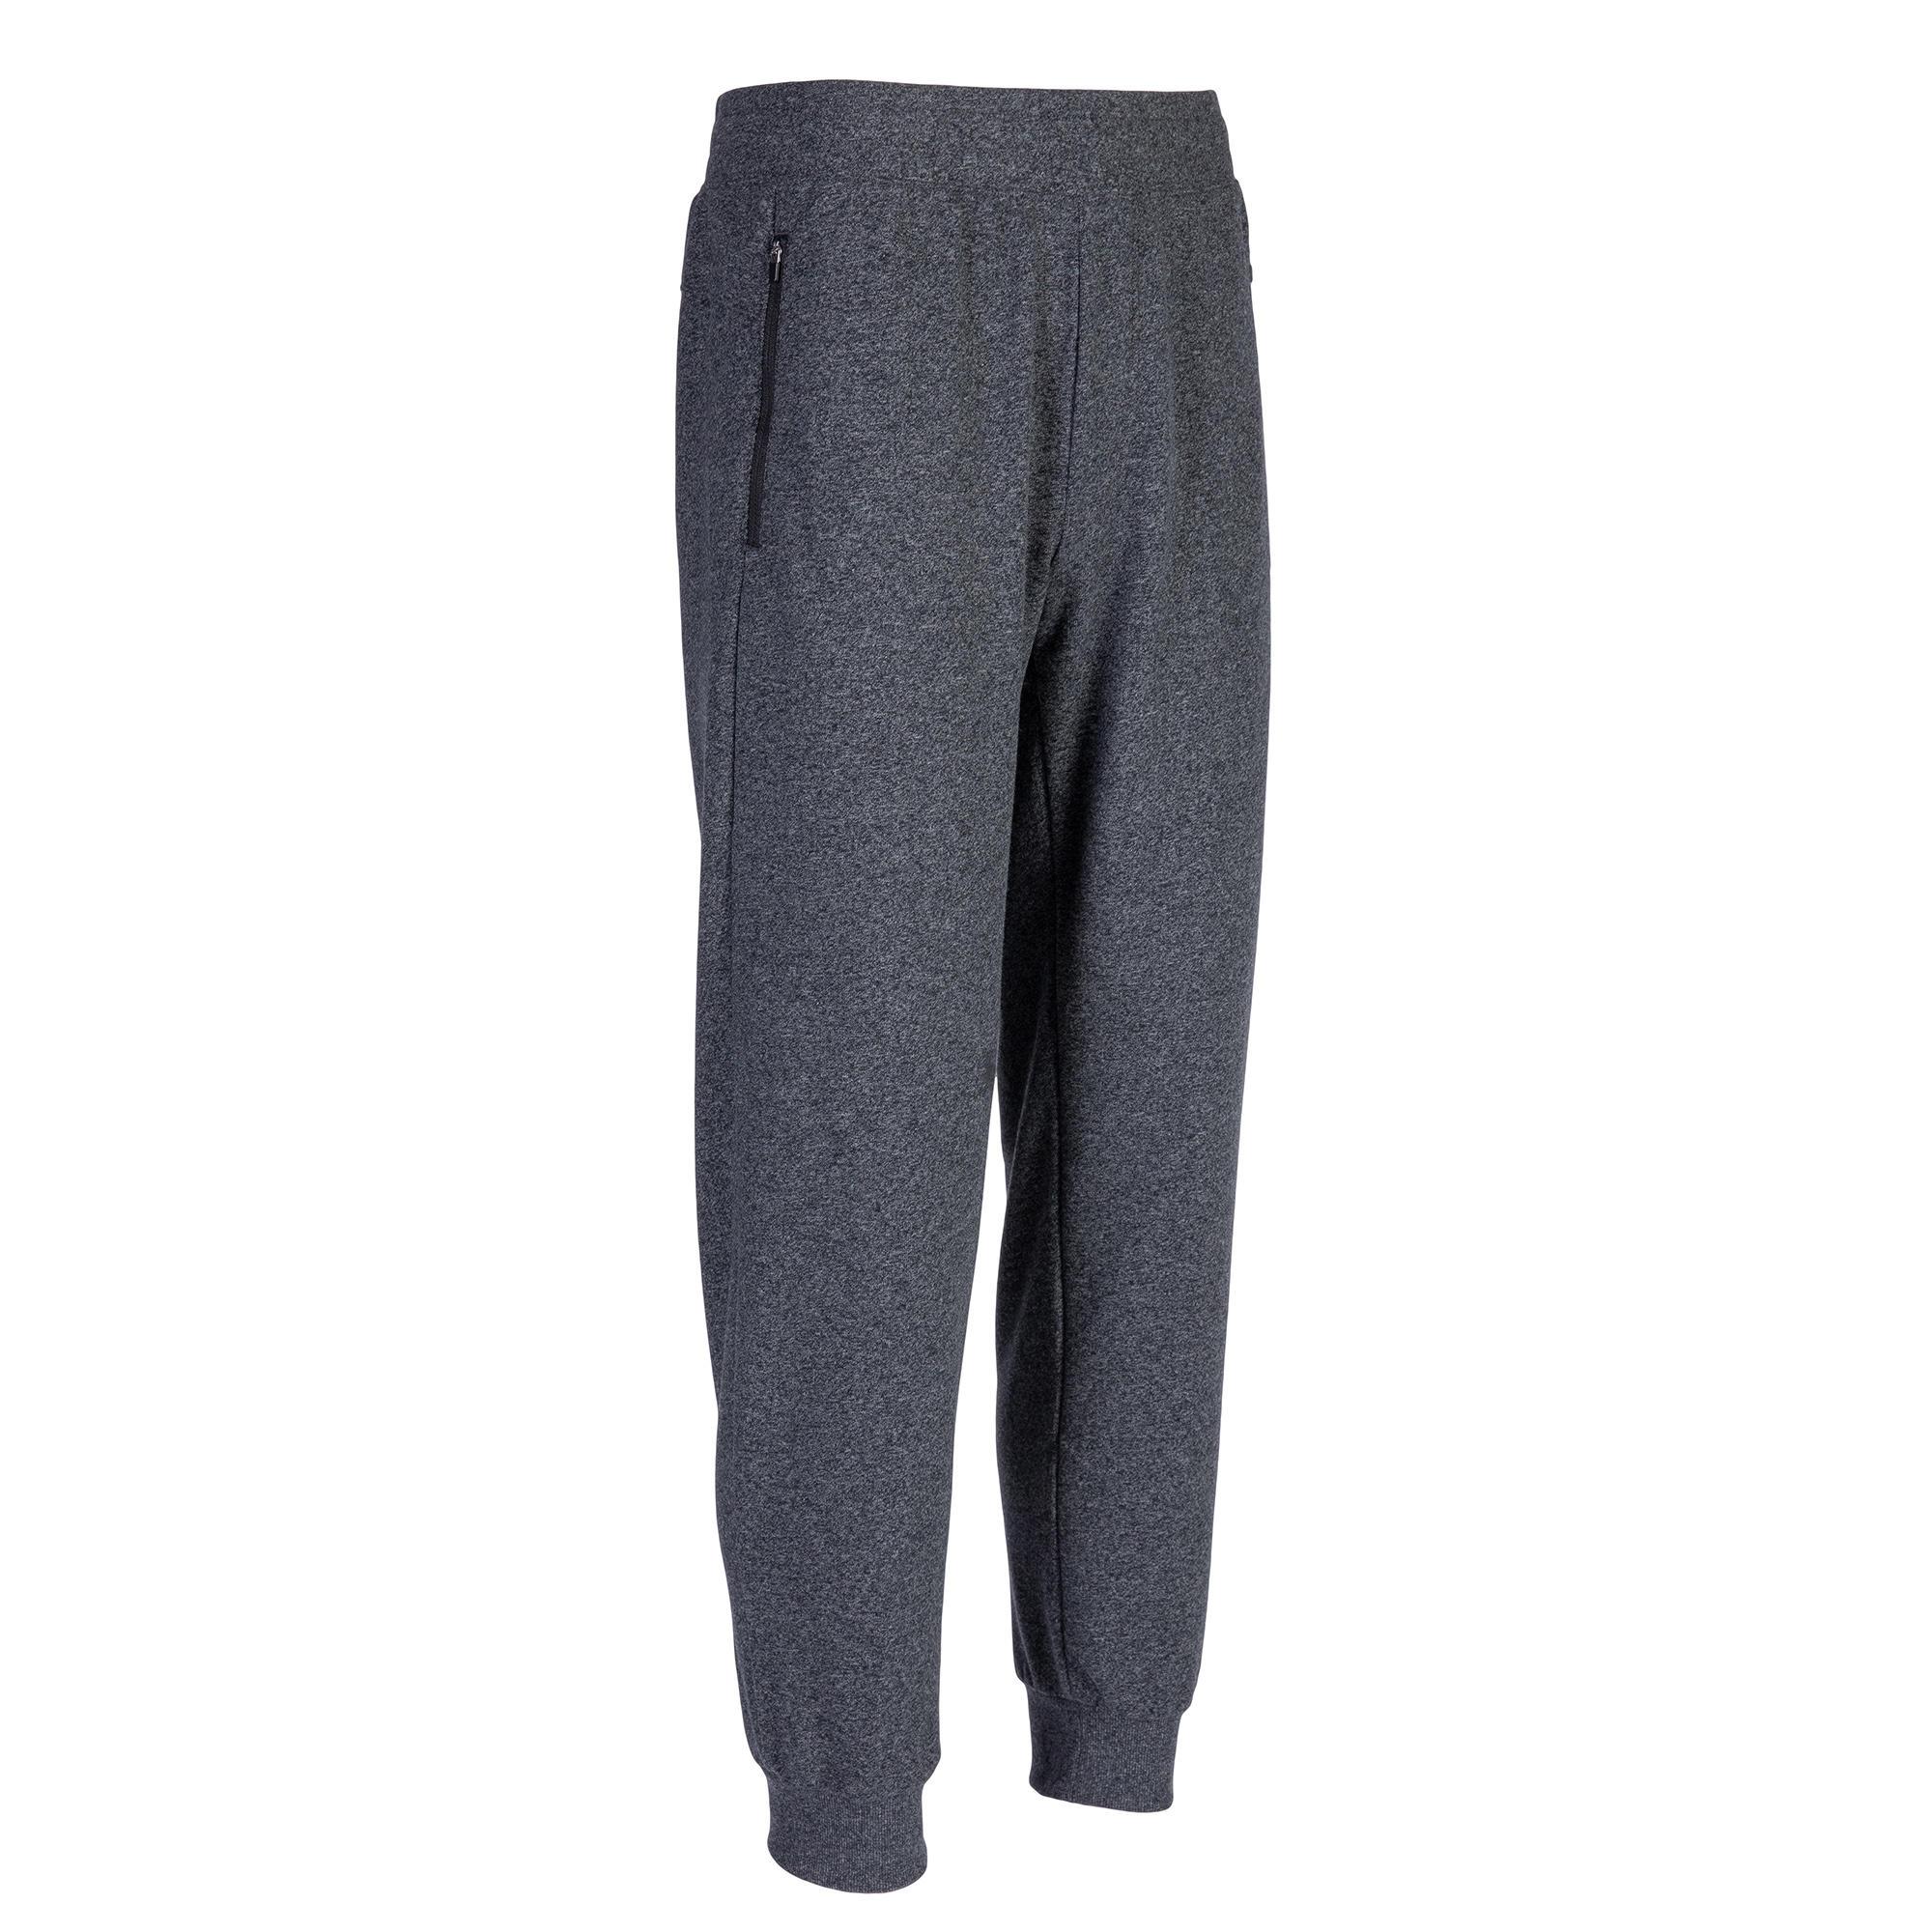 Pantalon 500 Gri Bărbați imagine